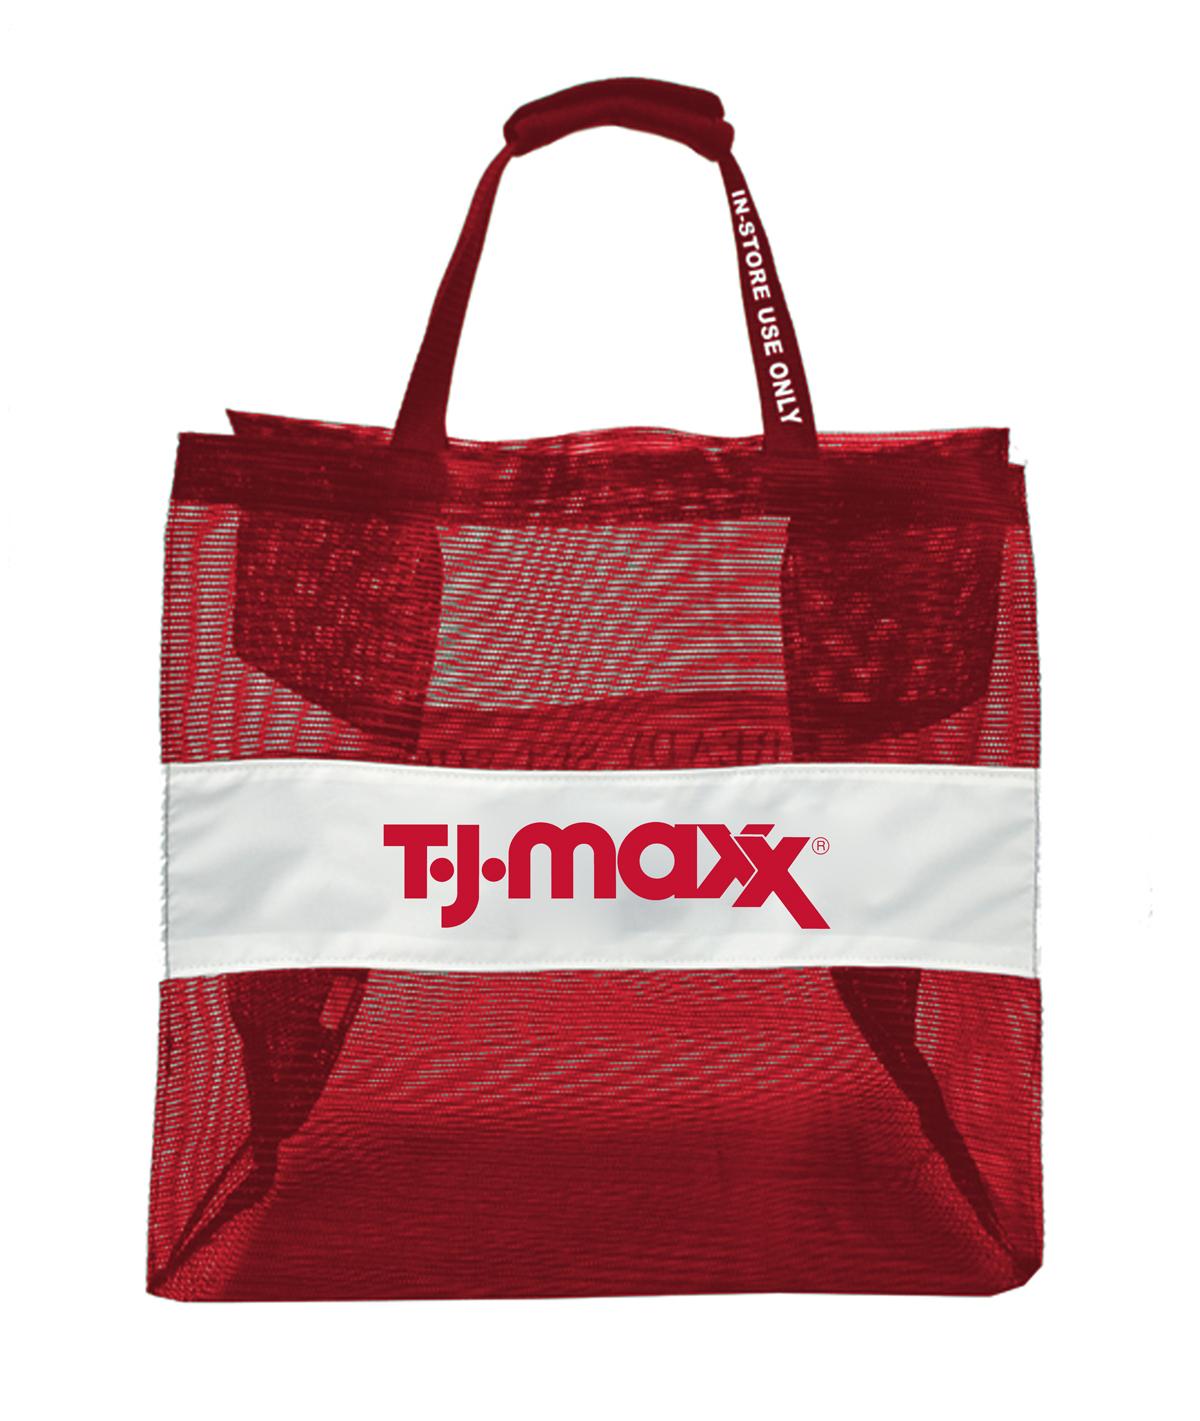 Tj Maxx Shopper - LBU